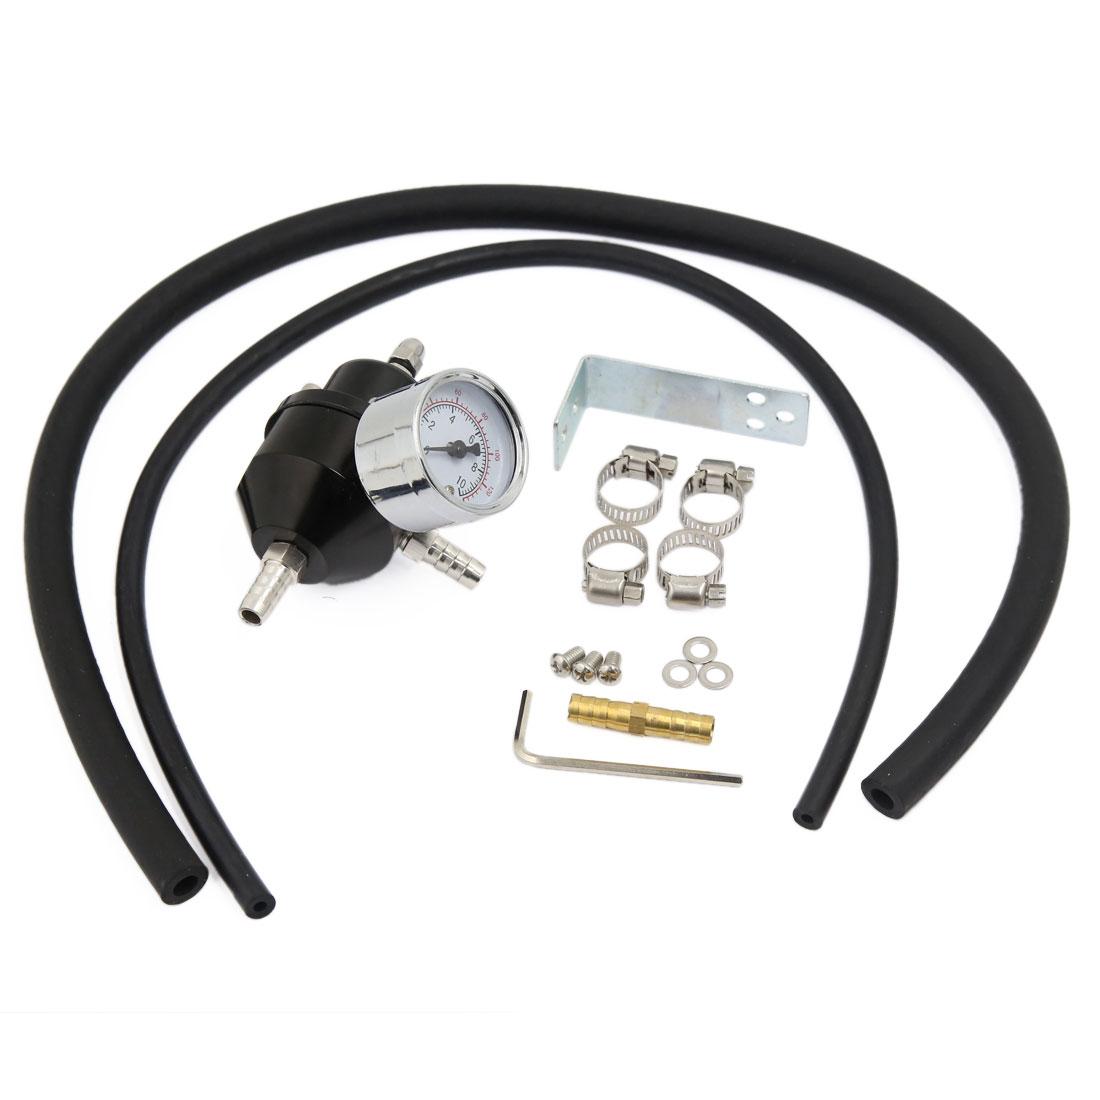 Universal Fuel Pressure Regulator 0-140 PSI Adjustable Gauge Hose Kit Black